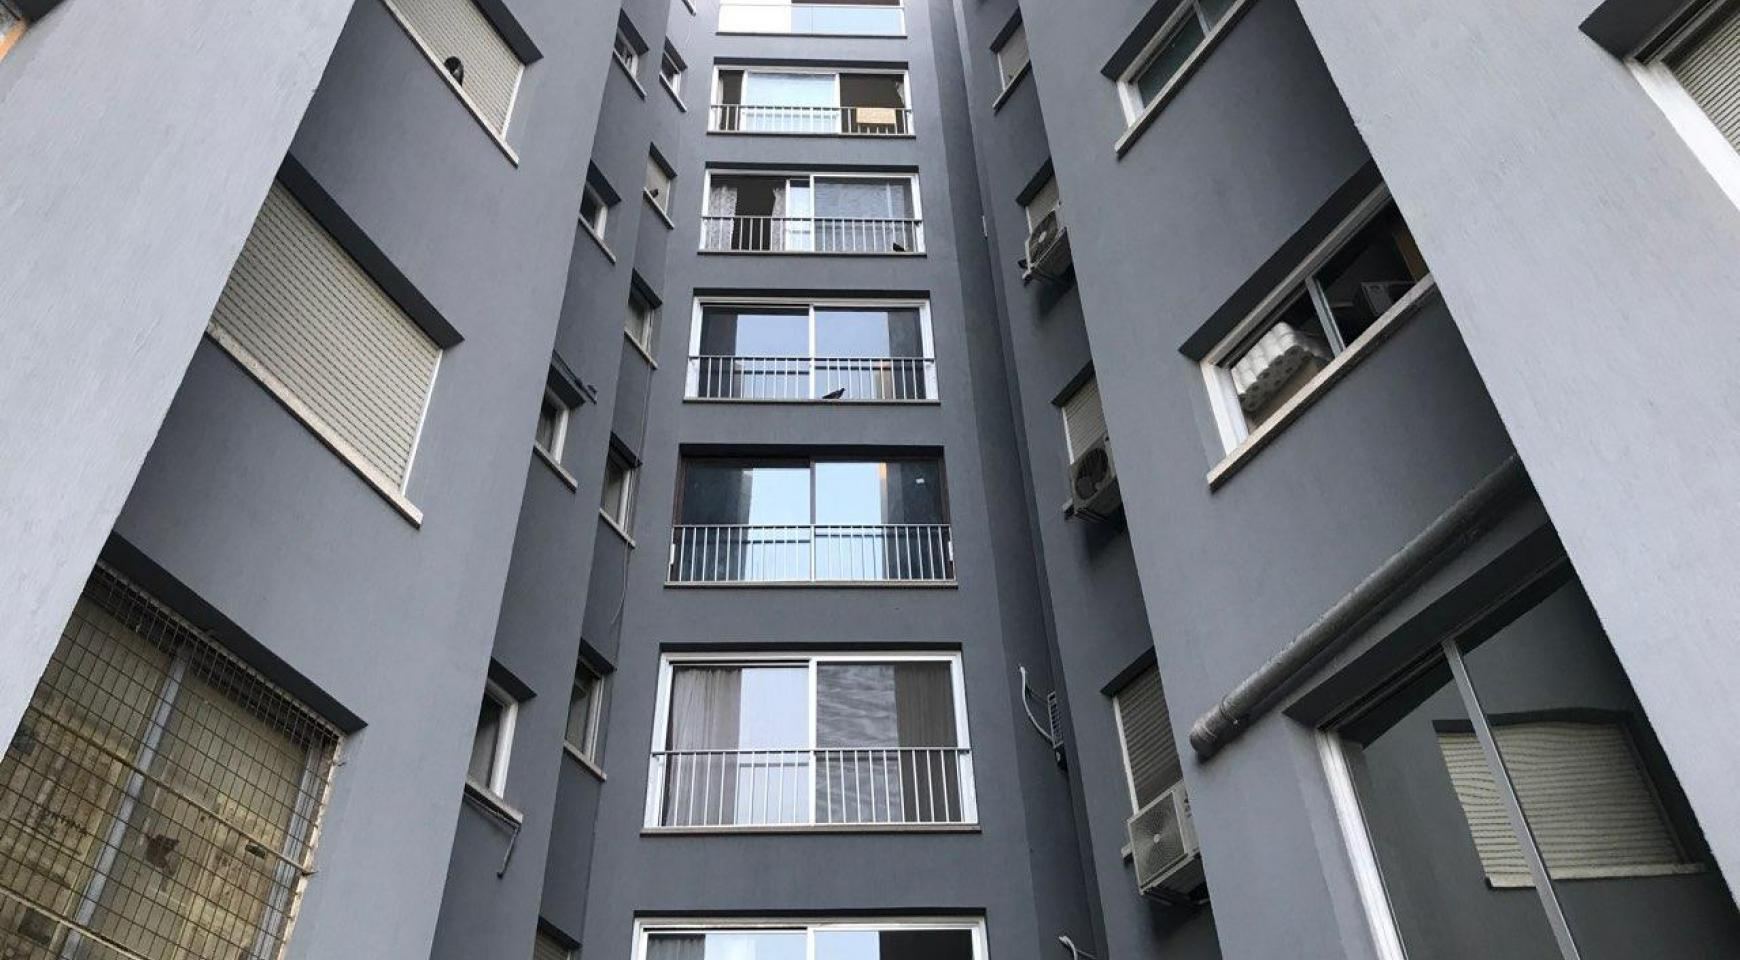 3 Bedroom Apartment in Molos Area near Limassol Marina - 24